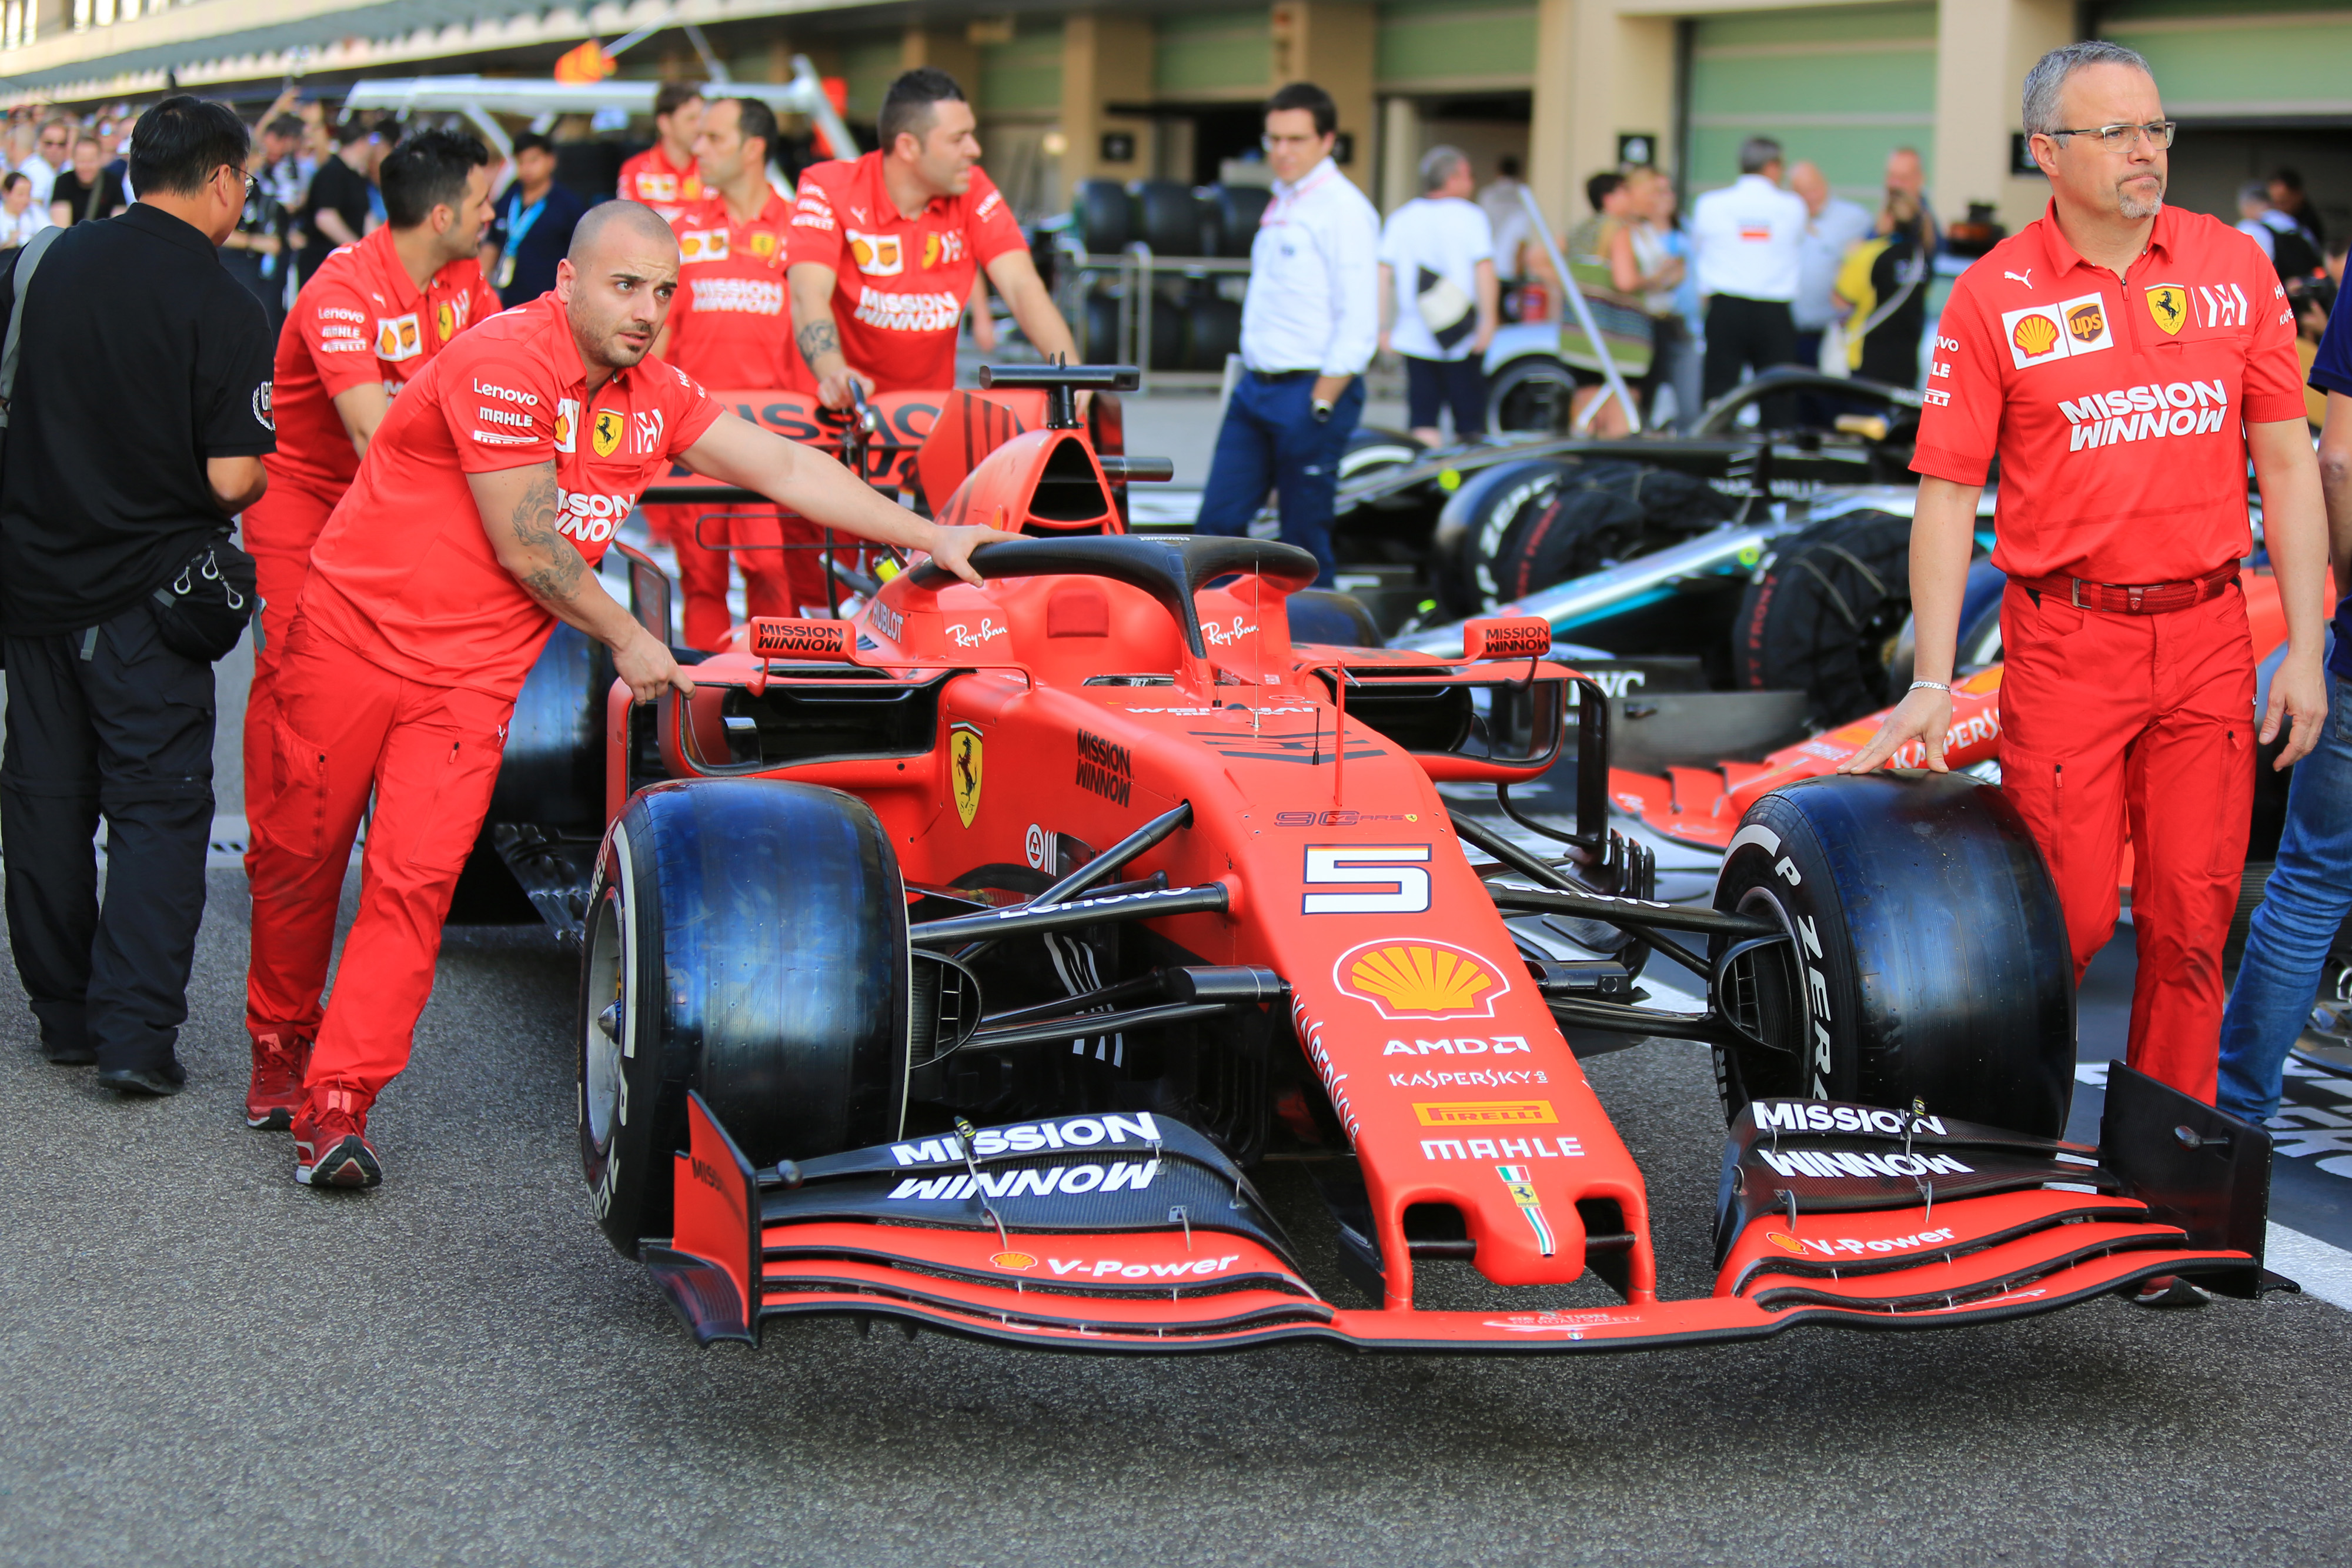 Formula 1 Fia Ferrari Reach Agreement After Power Unit Investigation